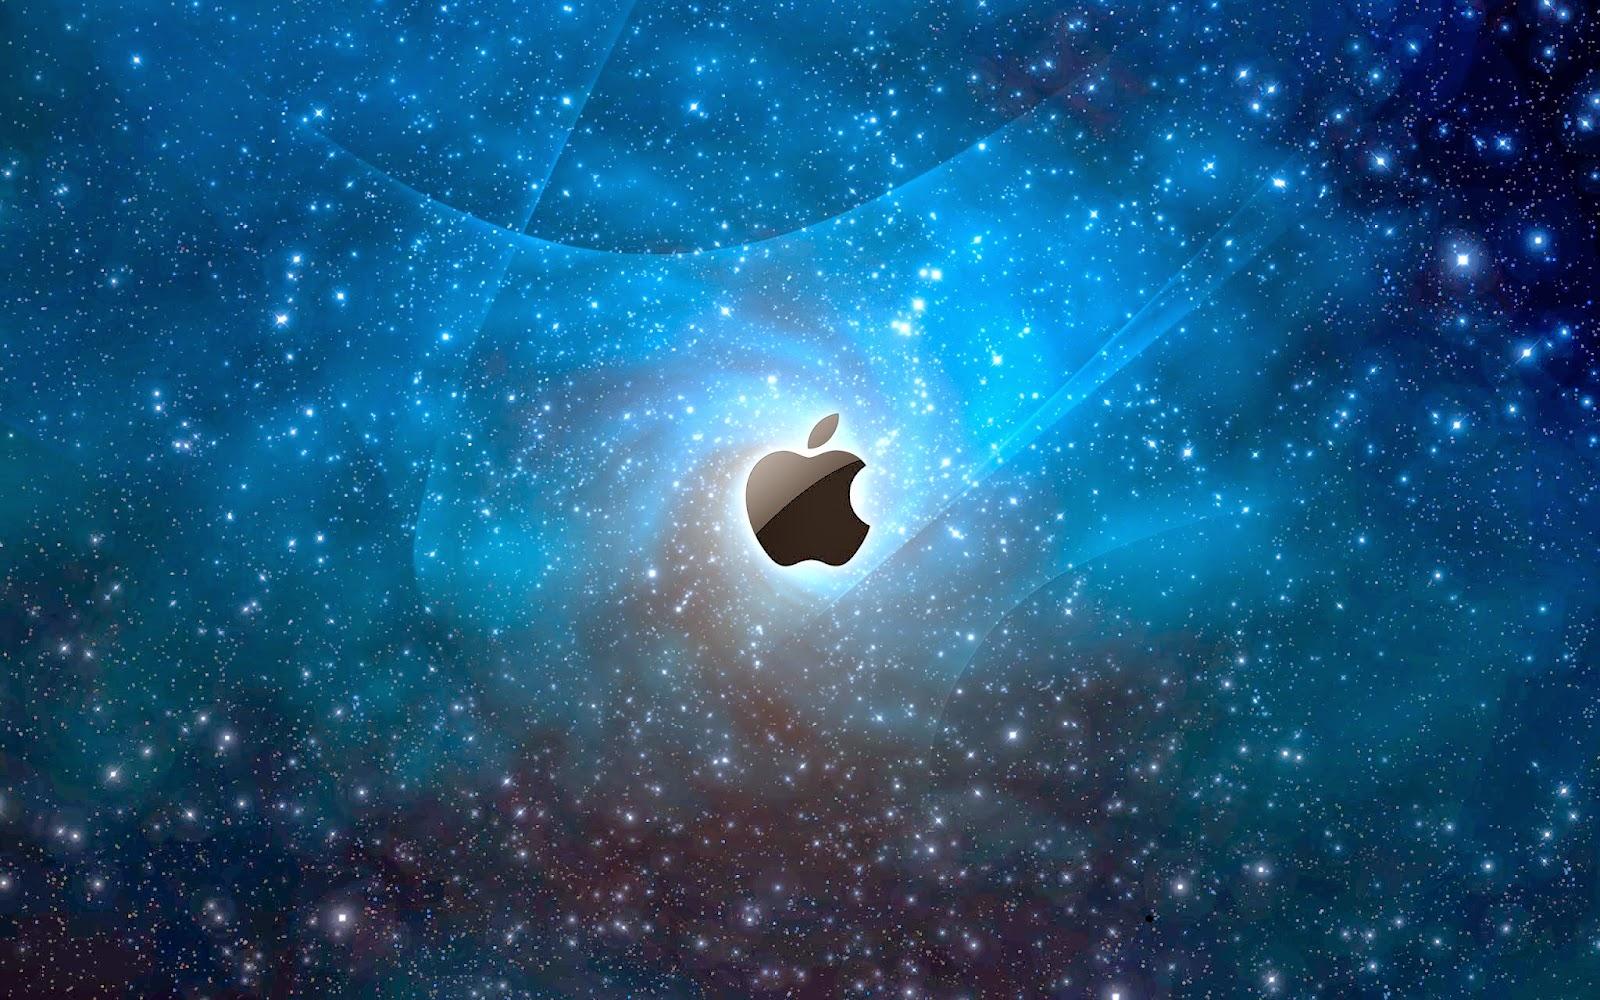 Apple New HD Wallpaper Wallpapers 1600x1000